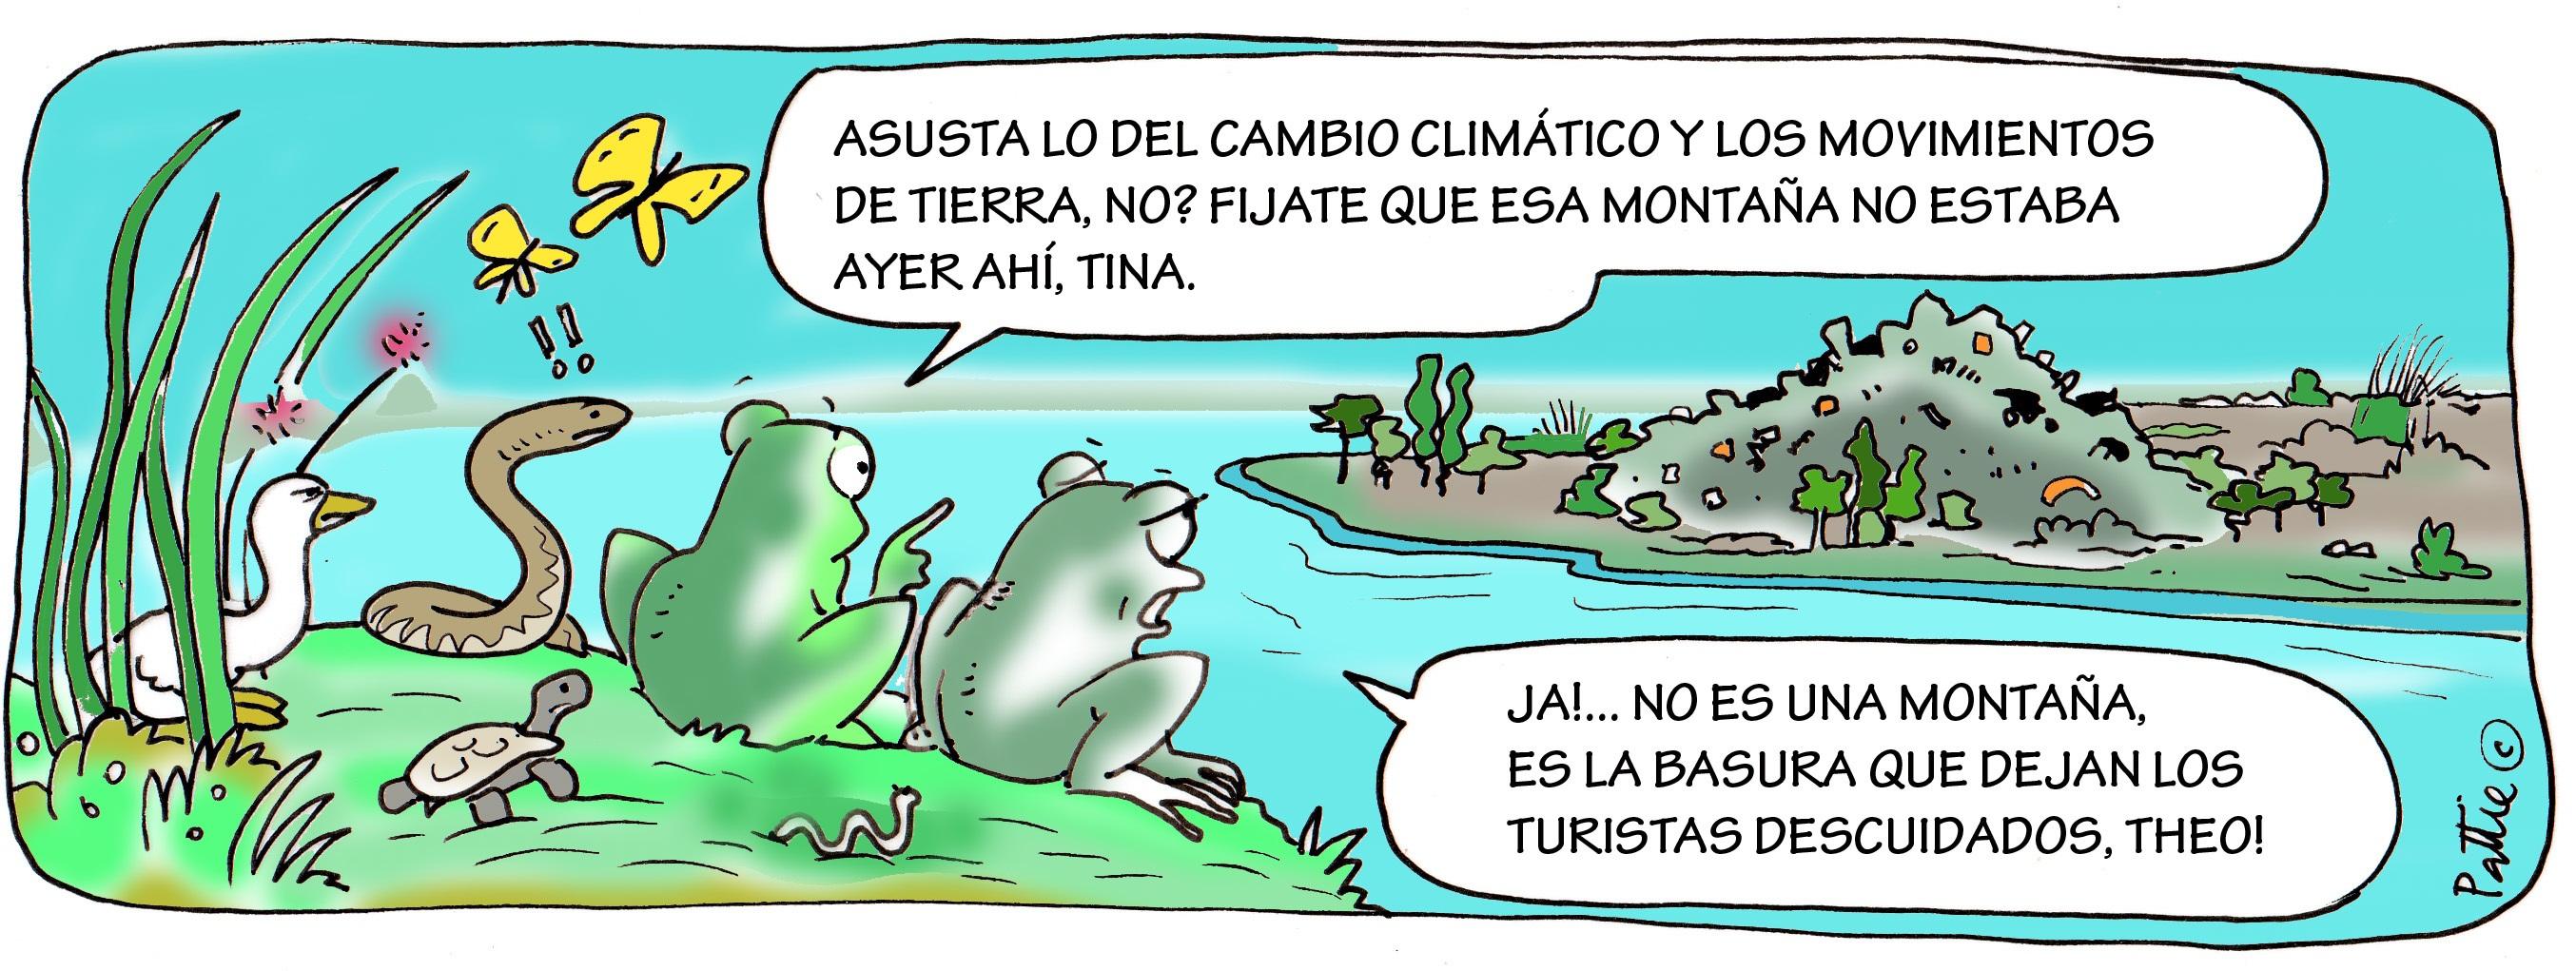 Wetland Environmental Cartoons